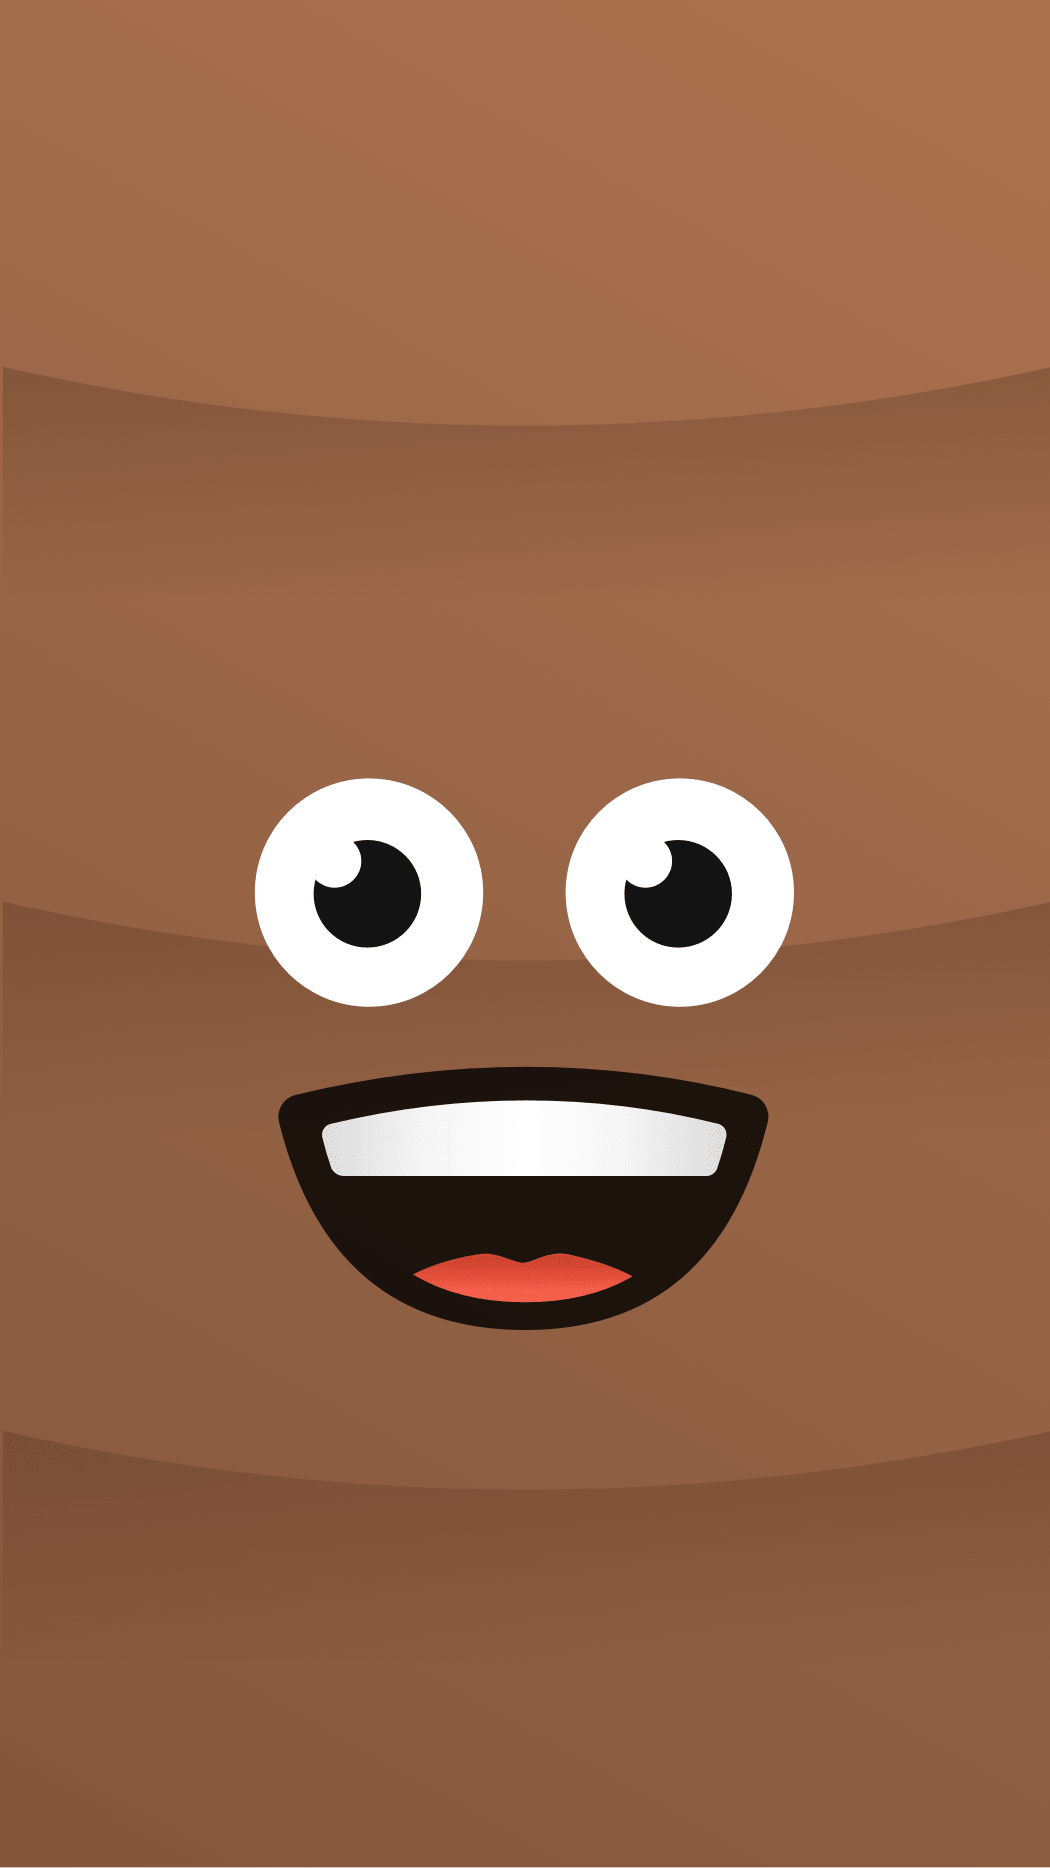 Free Emoji Wallpapers - by Simon Rahm